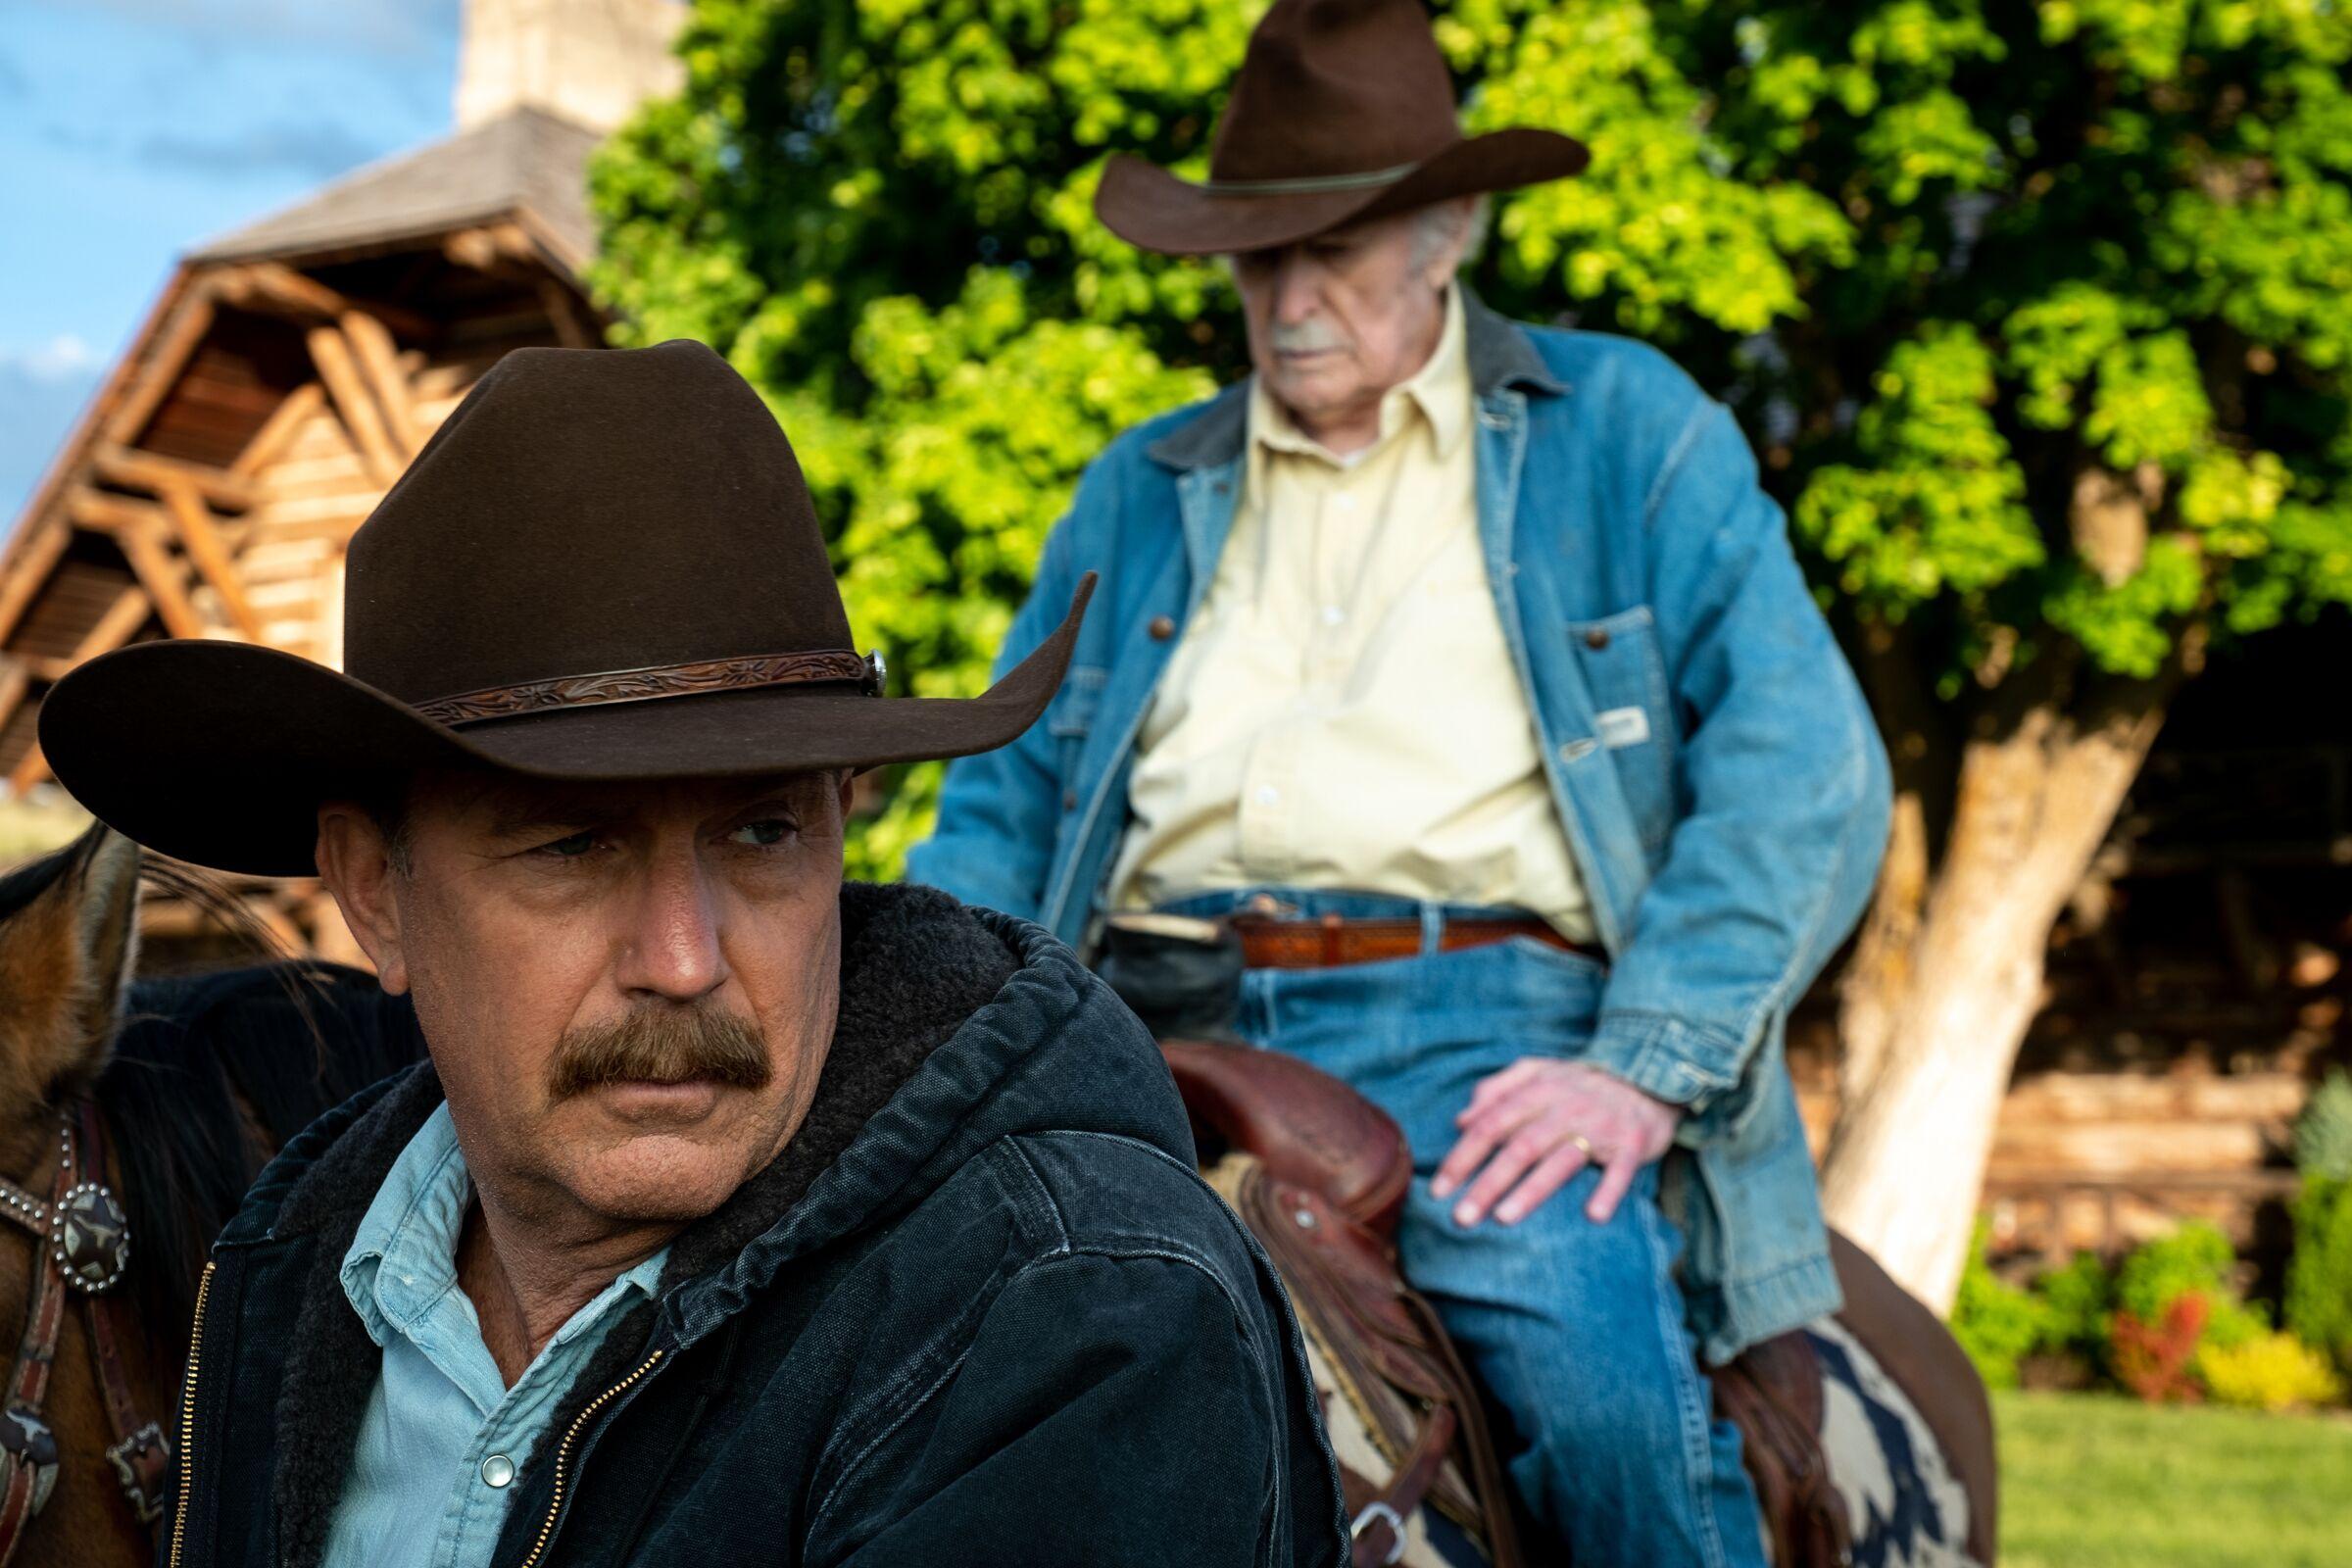 Yellowstone: Dabney Coleman guests in season 2 finale, Karen Pittman will recur in season 3